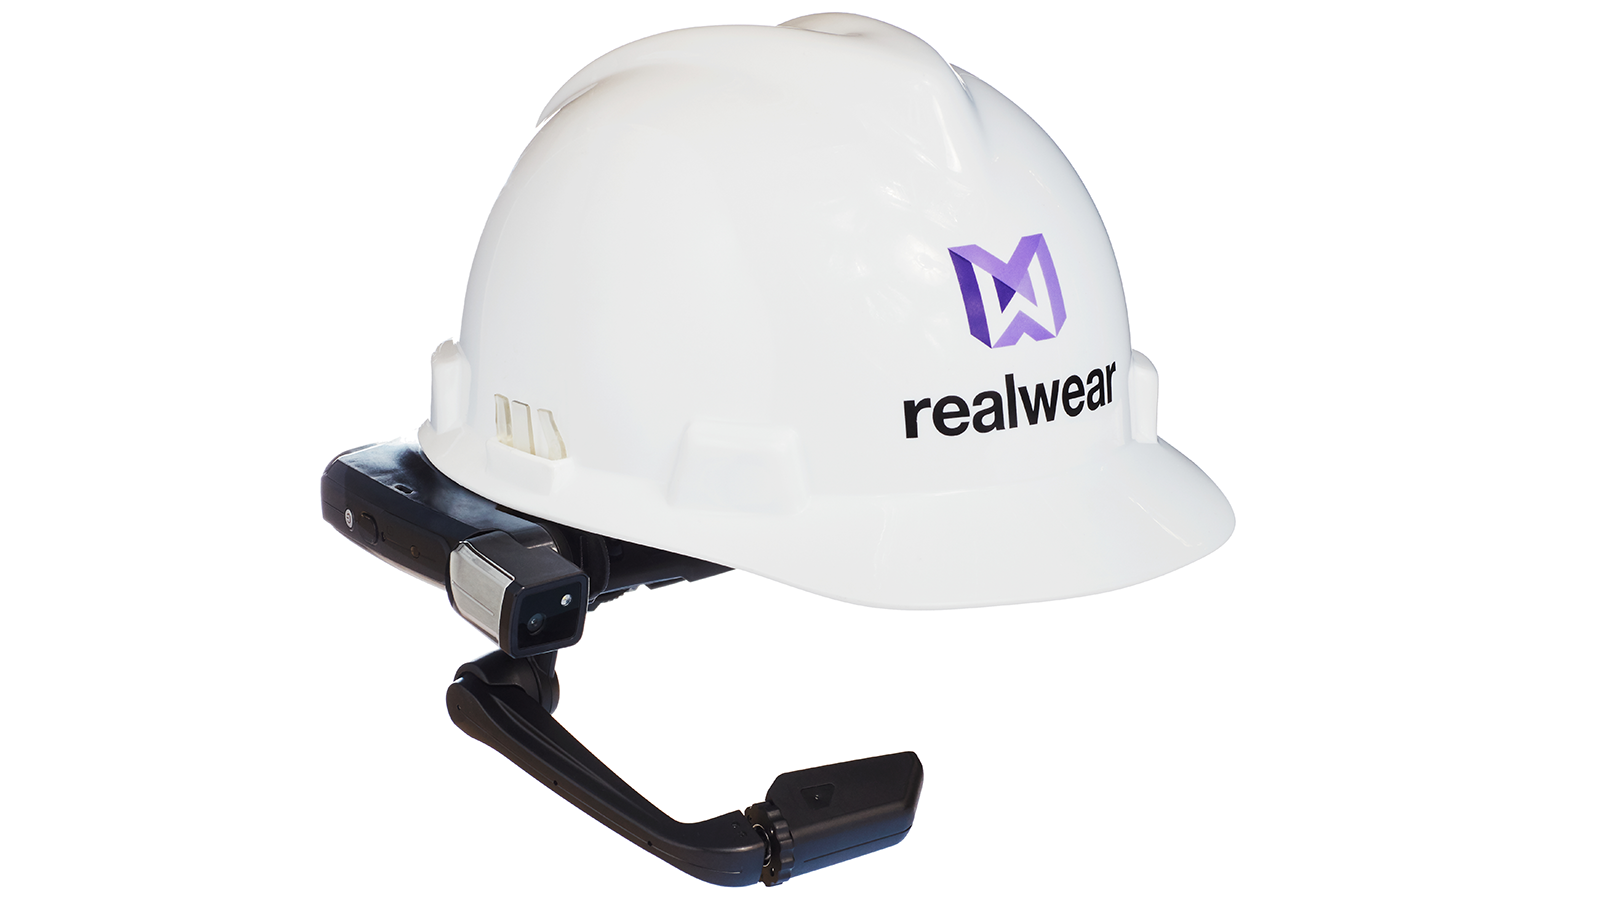 RealWear 헬멧 이미지